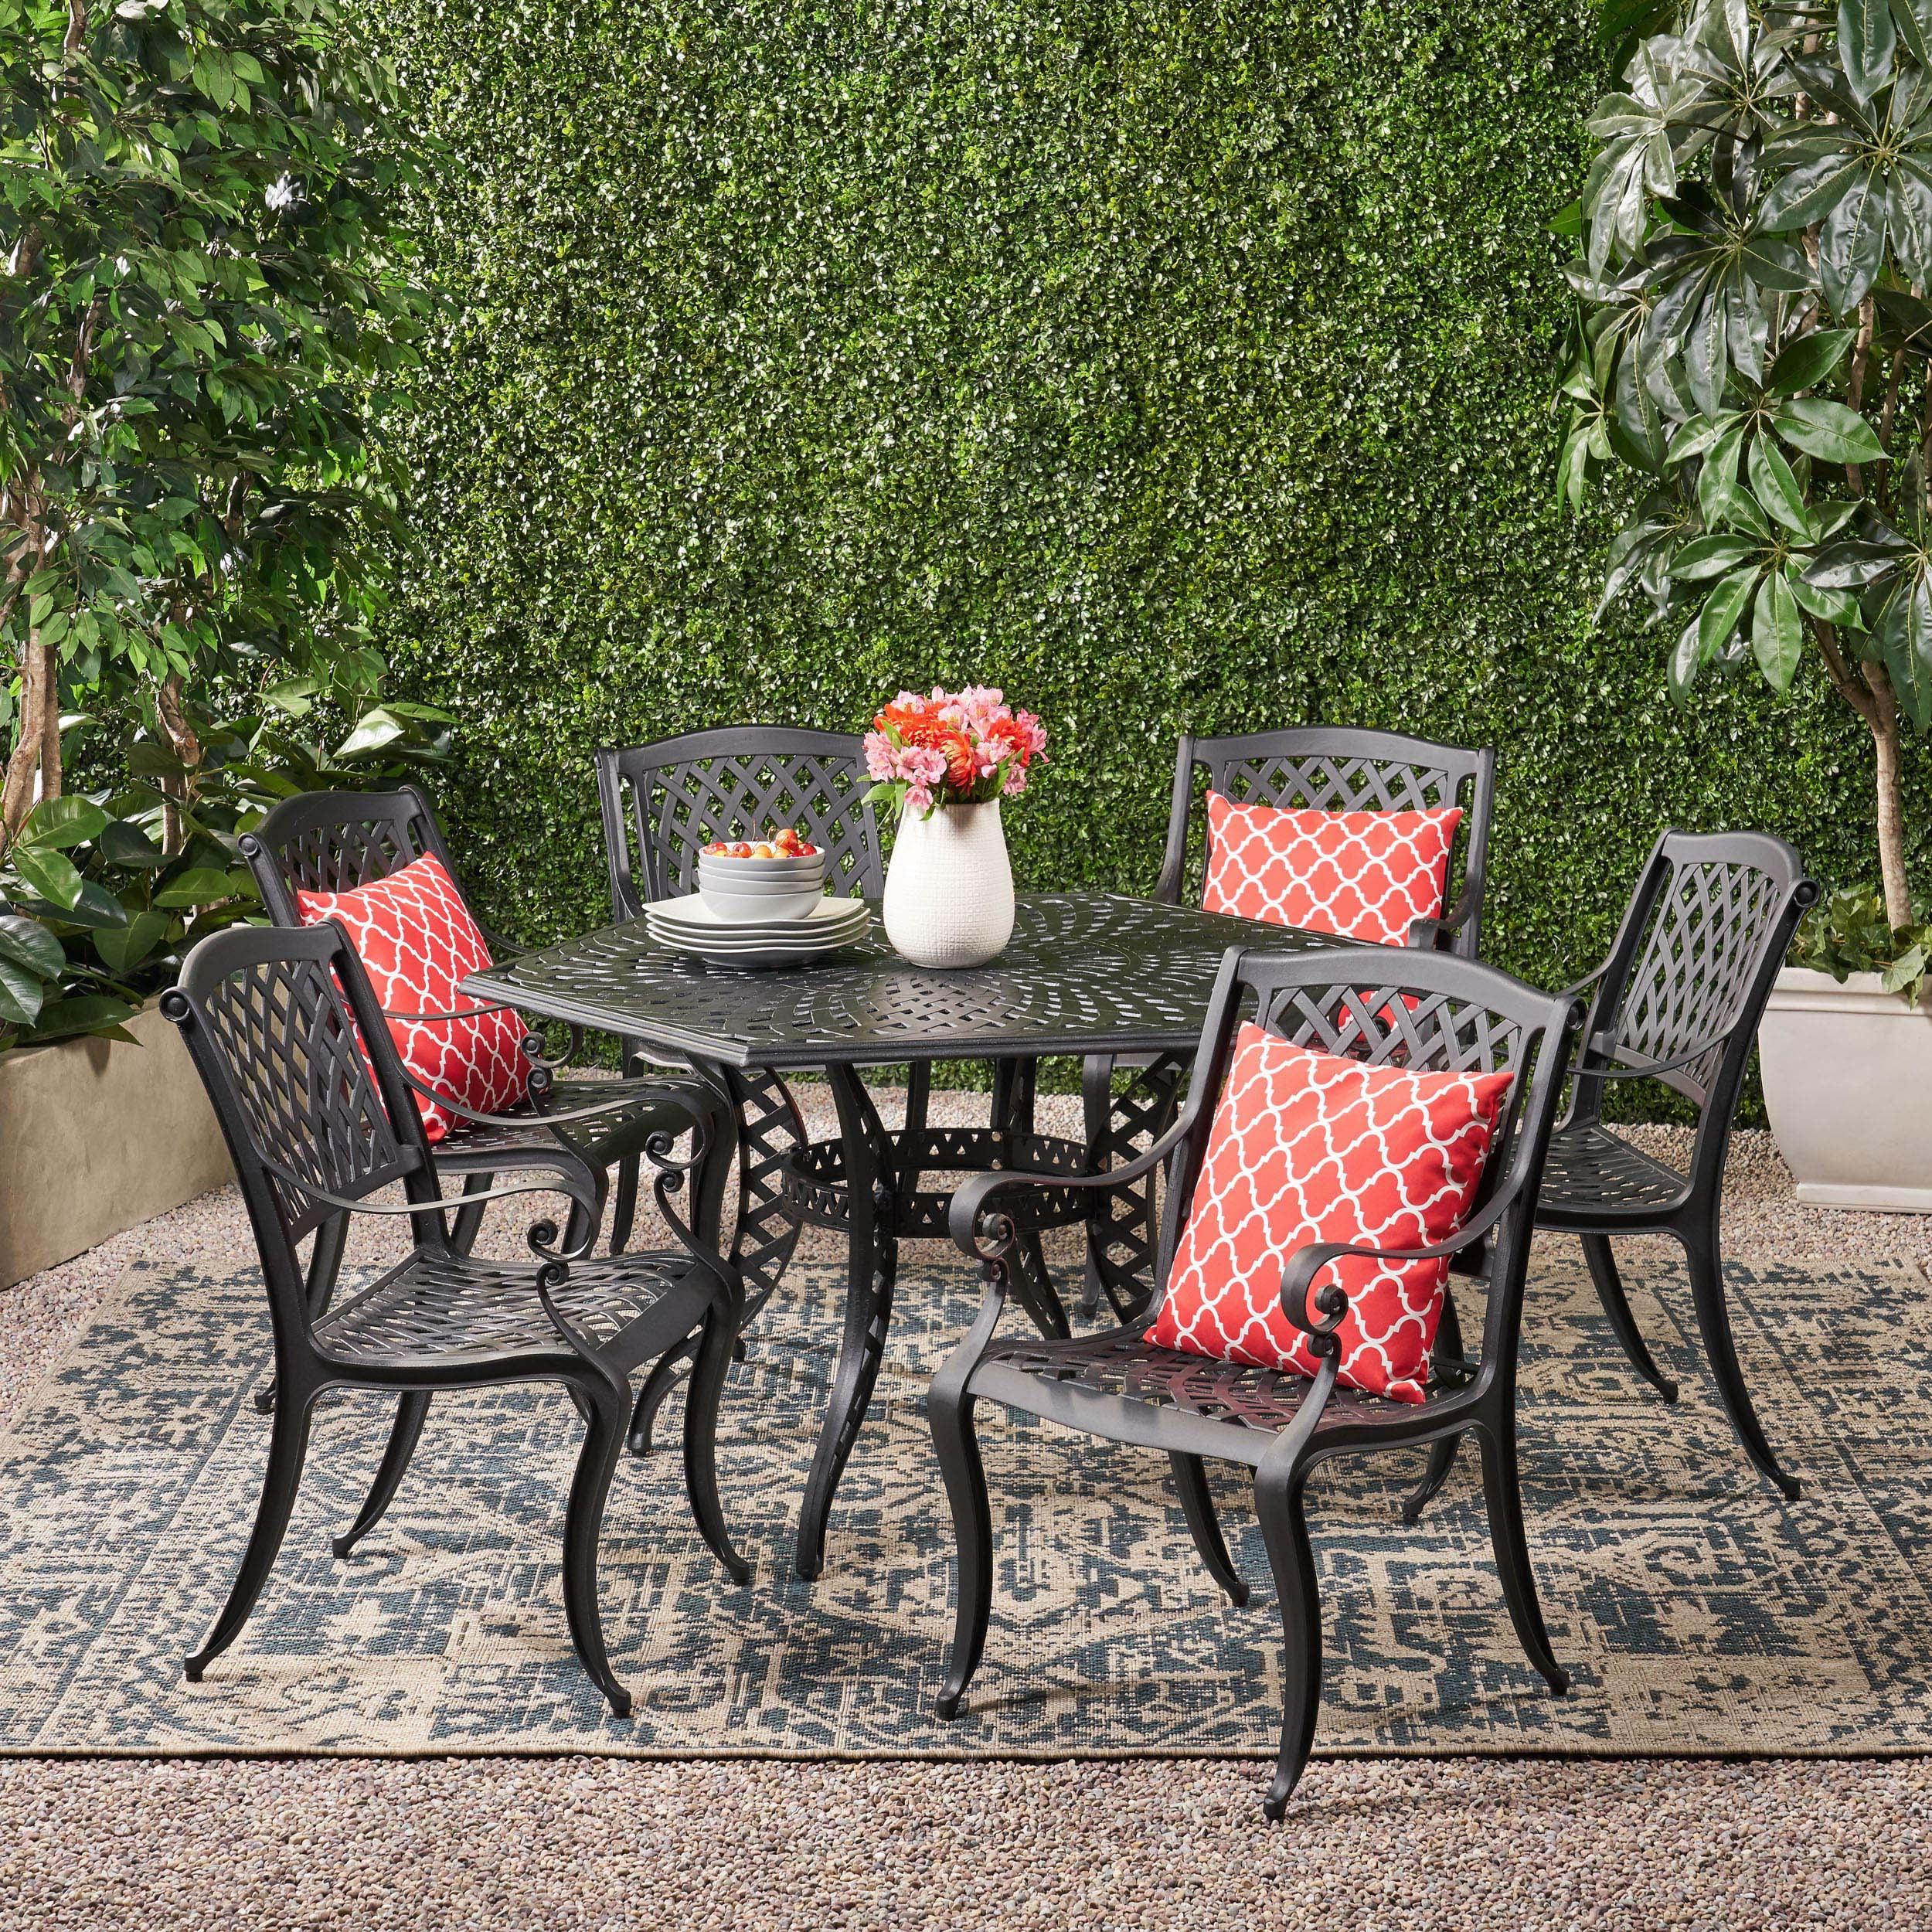 Holliday 10 piece Cast Aluminum Outdoor Dining Set, Black Sand   Walmart.com